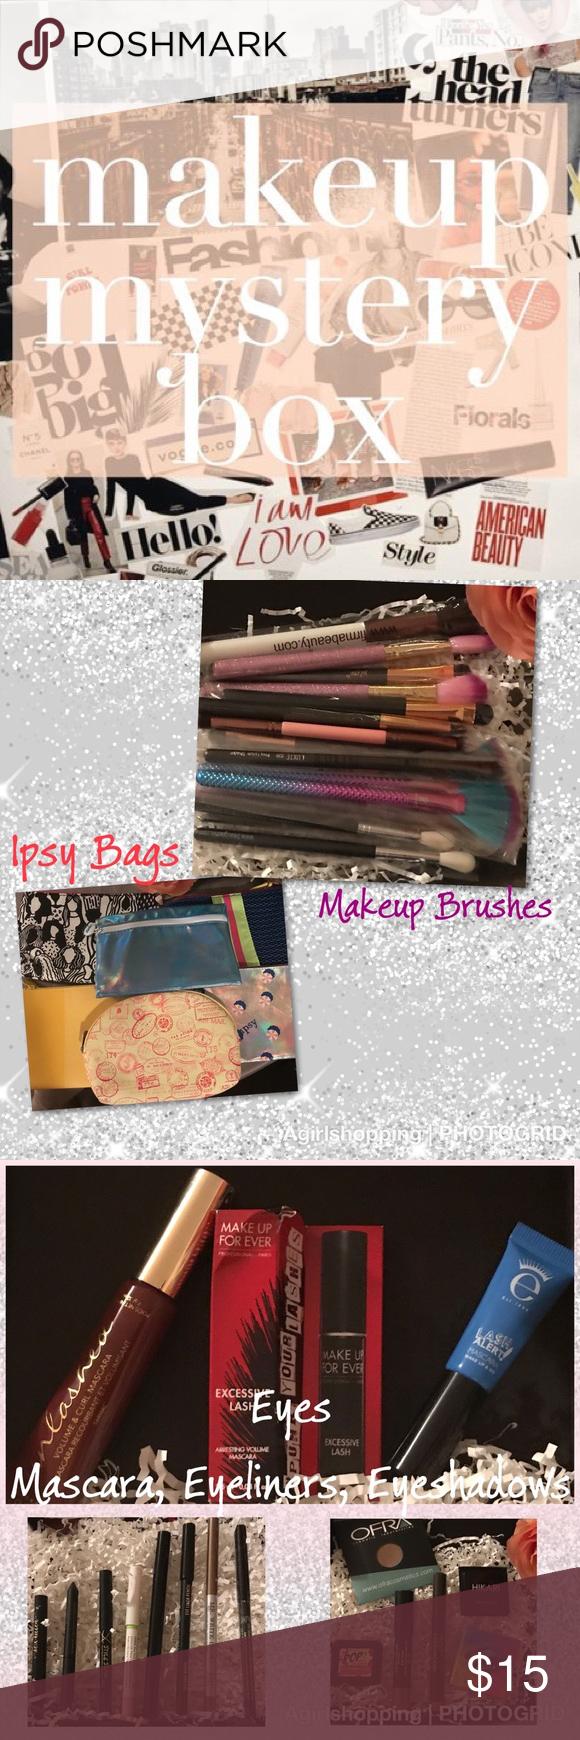 Designer HighEnd Surprise/Mystery Beauty Box All